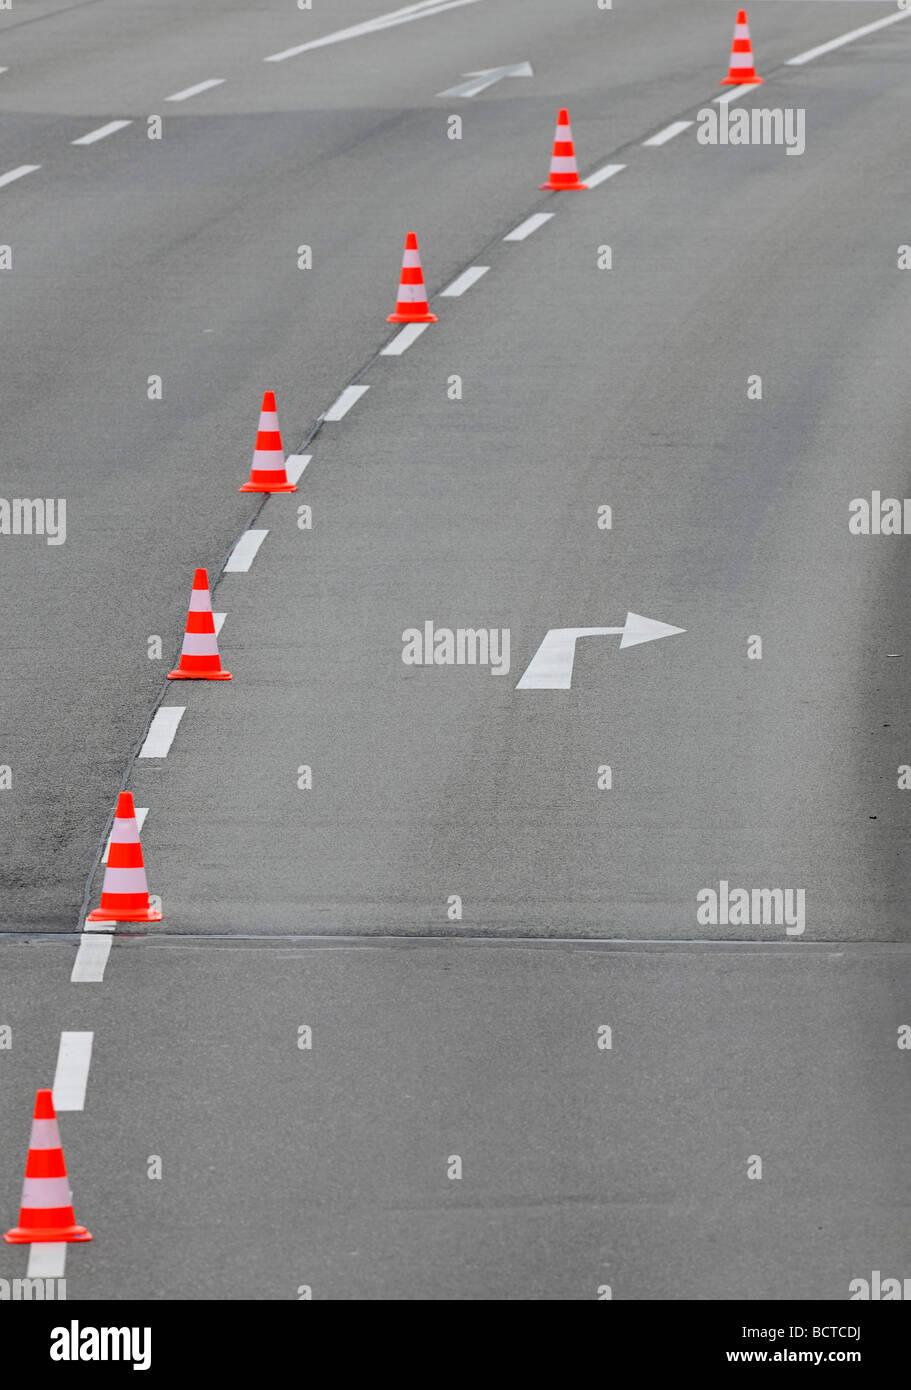 Traffic cones dividing a road lane - Stock Image